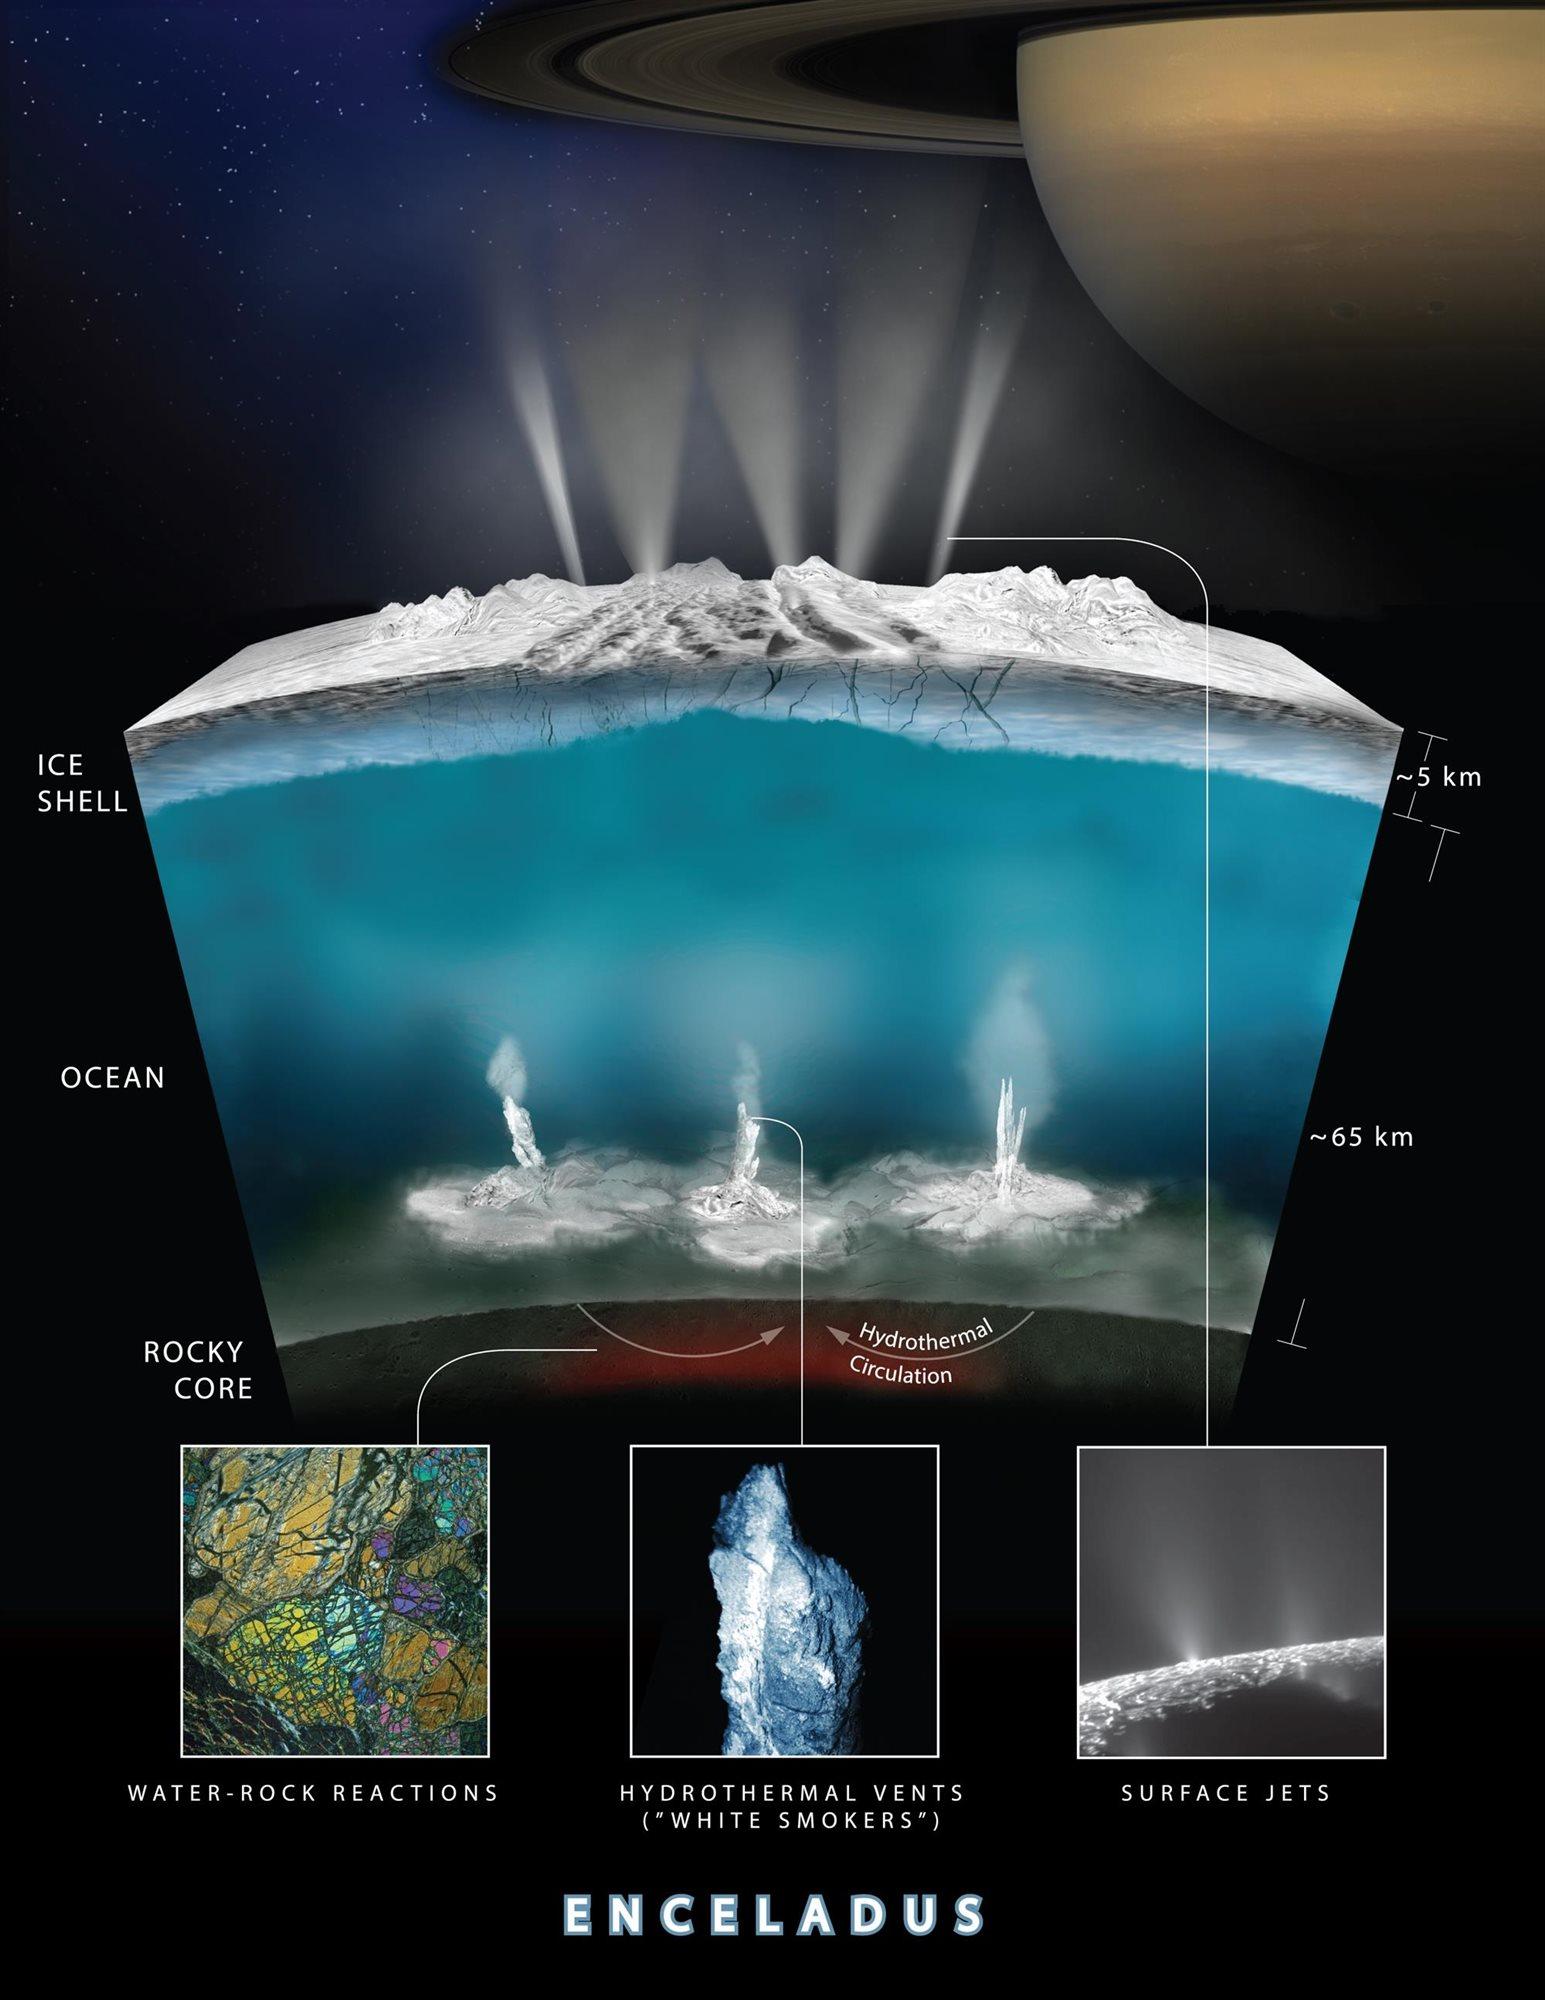 Encelado1_2d784e5b_1545x2000